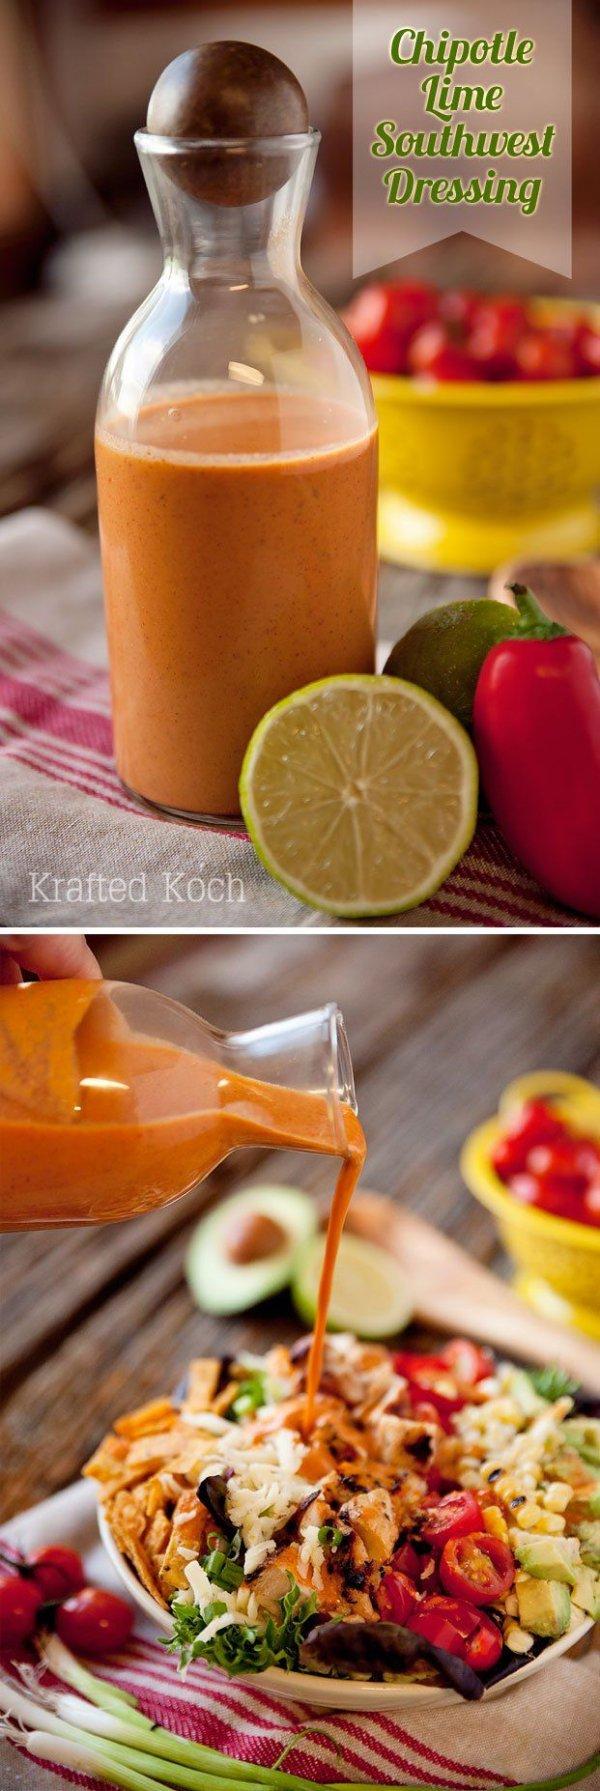 Chipotle Lime Southwest Salad Dressing